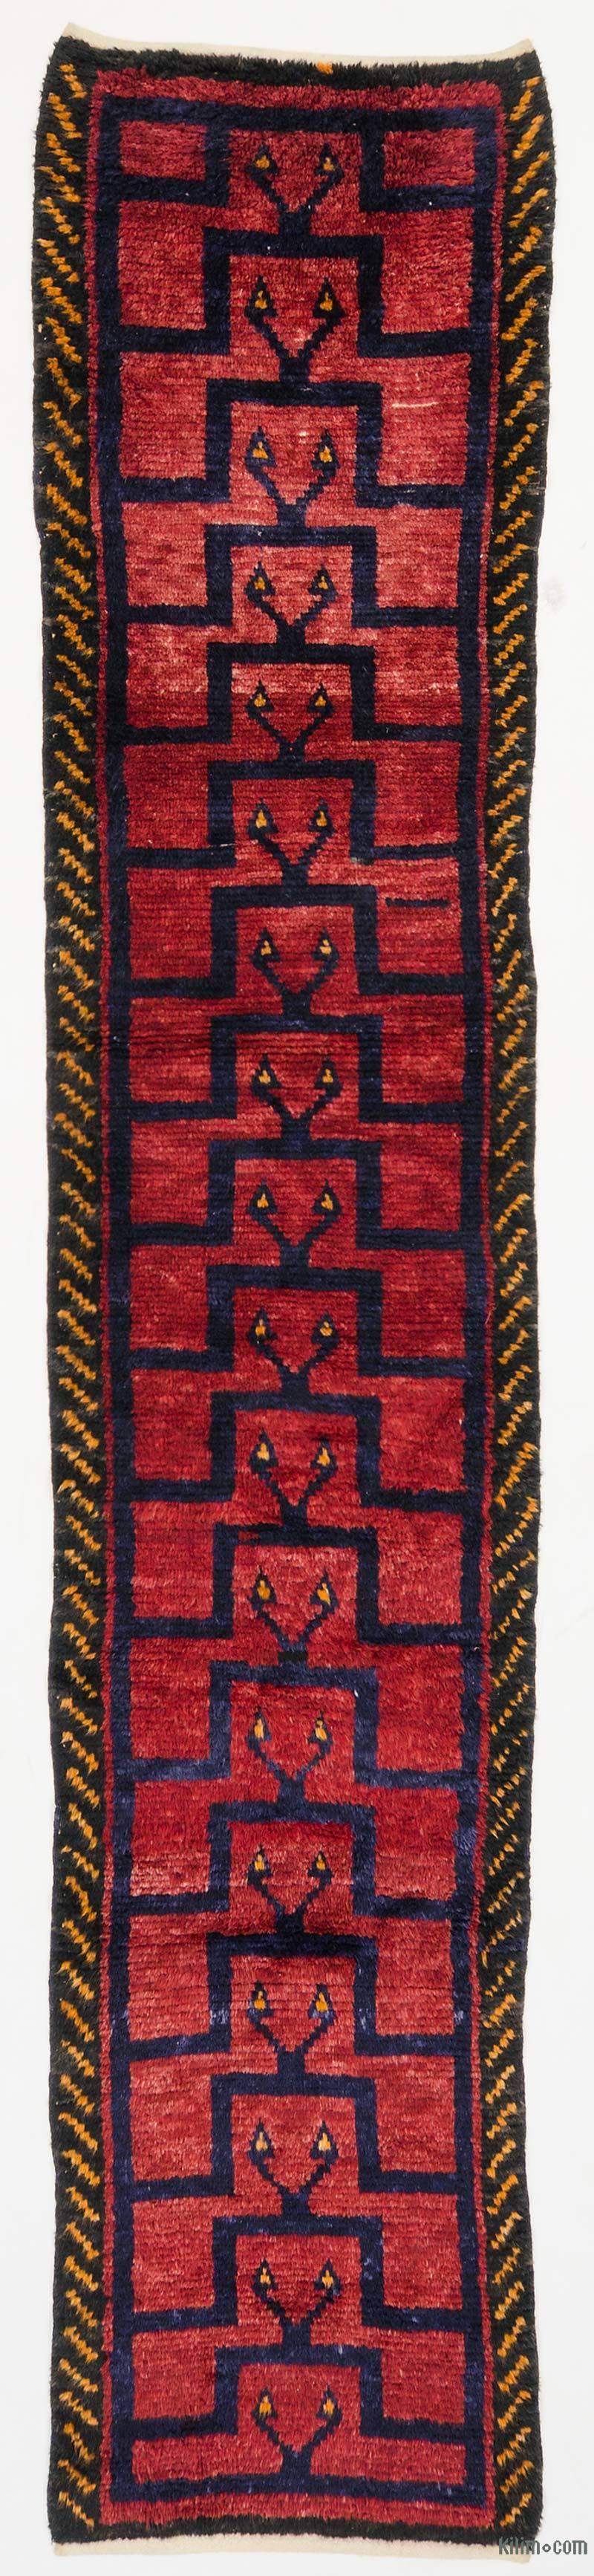 "Red Vintage Turkish Runner Rug - 2' 8"" x 12' 6"" (32 in. x 150 in.) - K0036937"